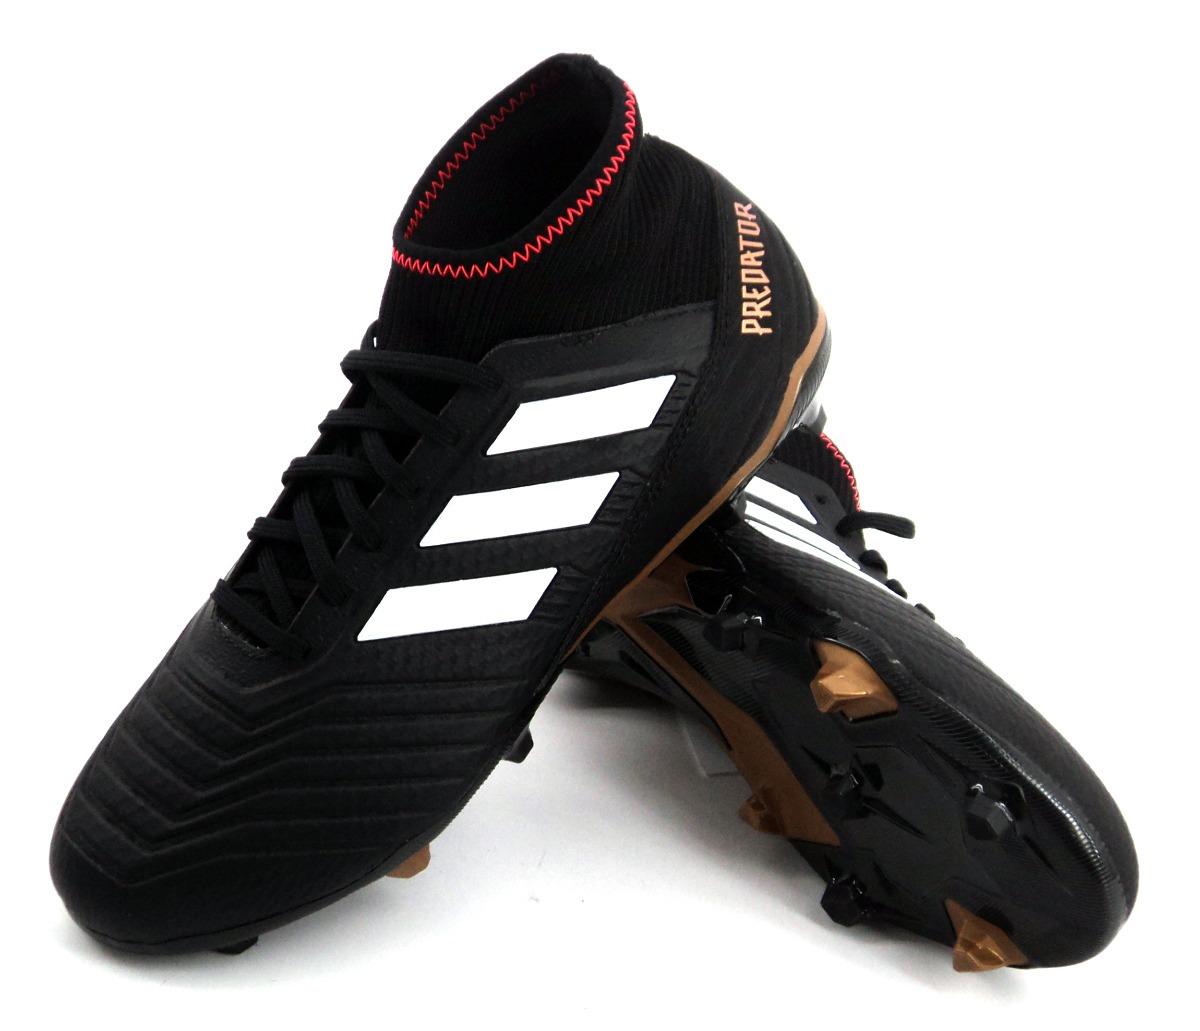 ... discount code for botin adidas predator 18.3 fg negro fútbol adulto  eezap. cargando zoom. cbf74726c5b